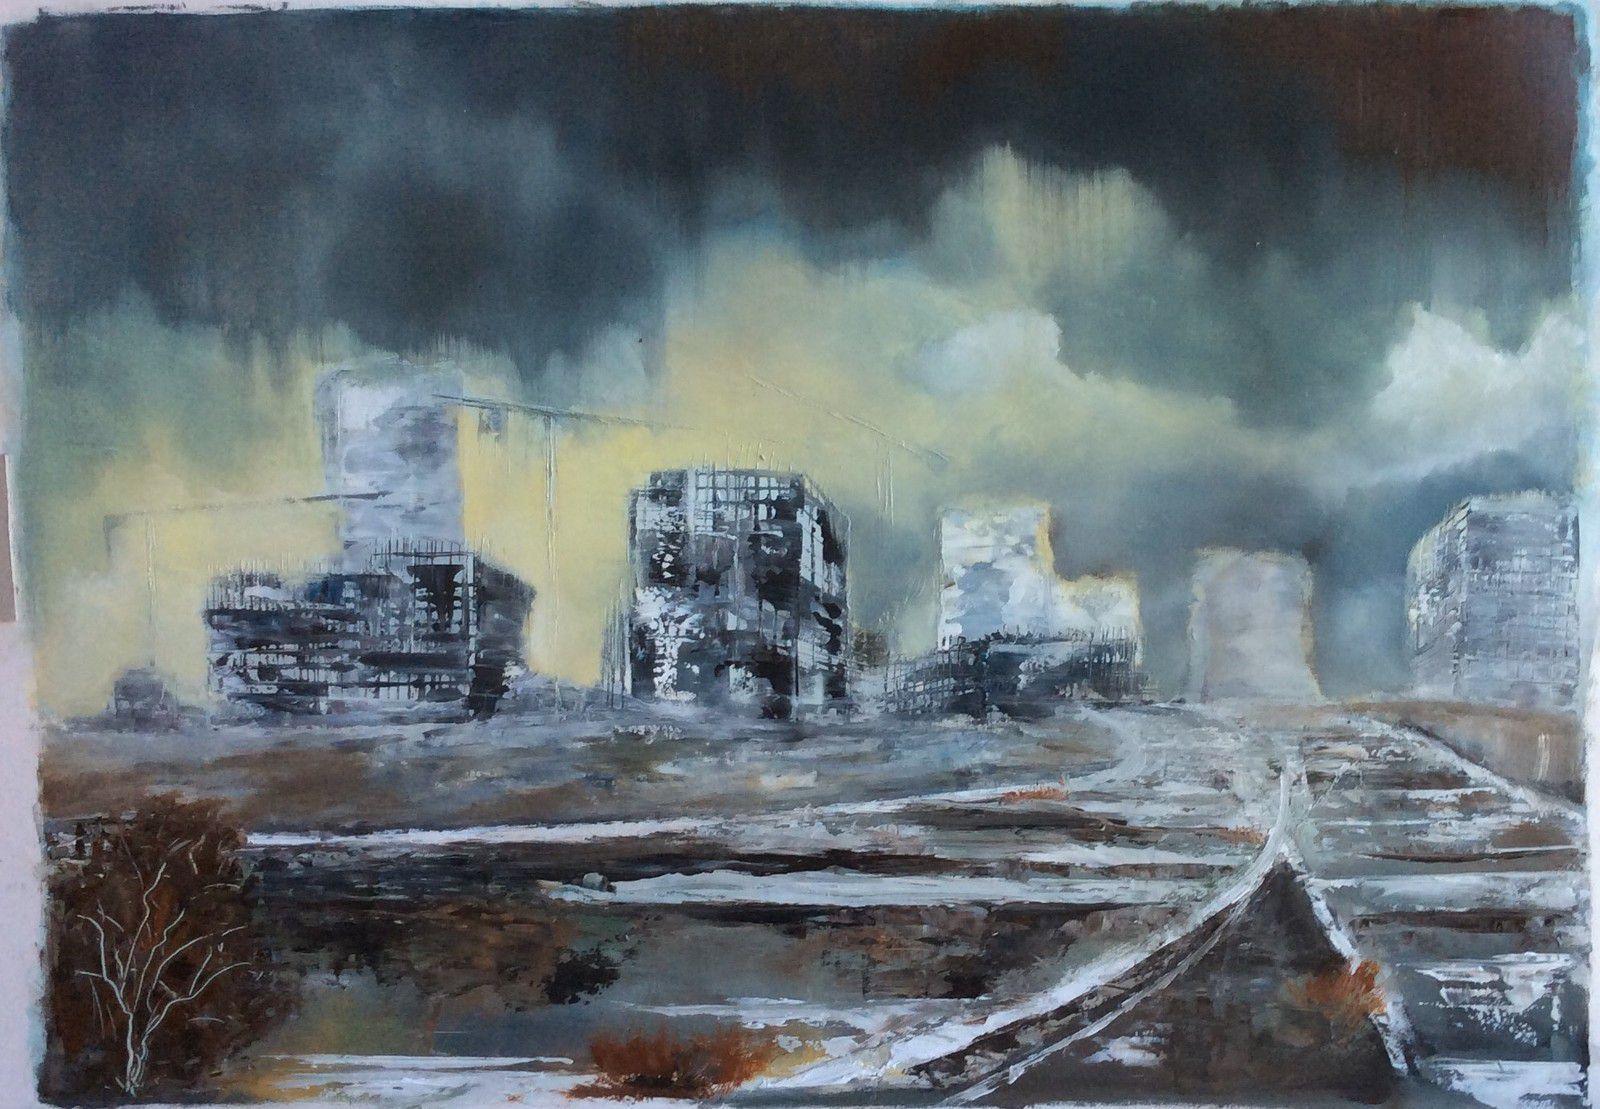 Le monde selon Paugam, artiste peintre